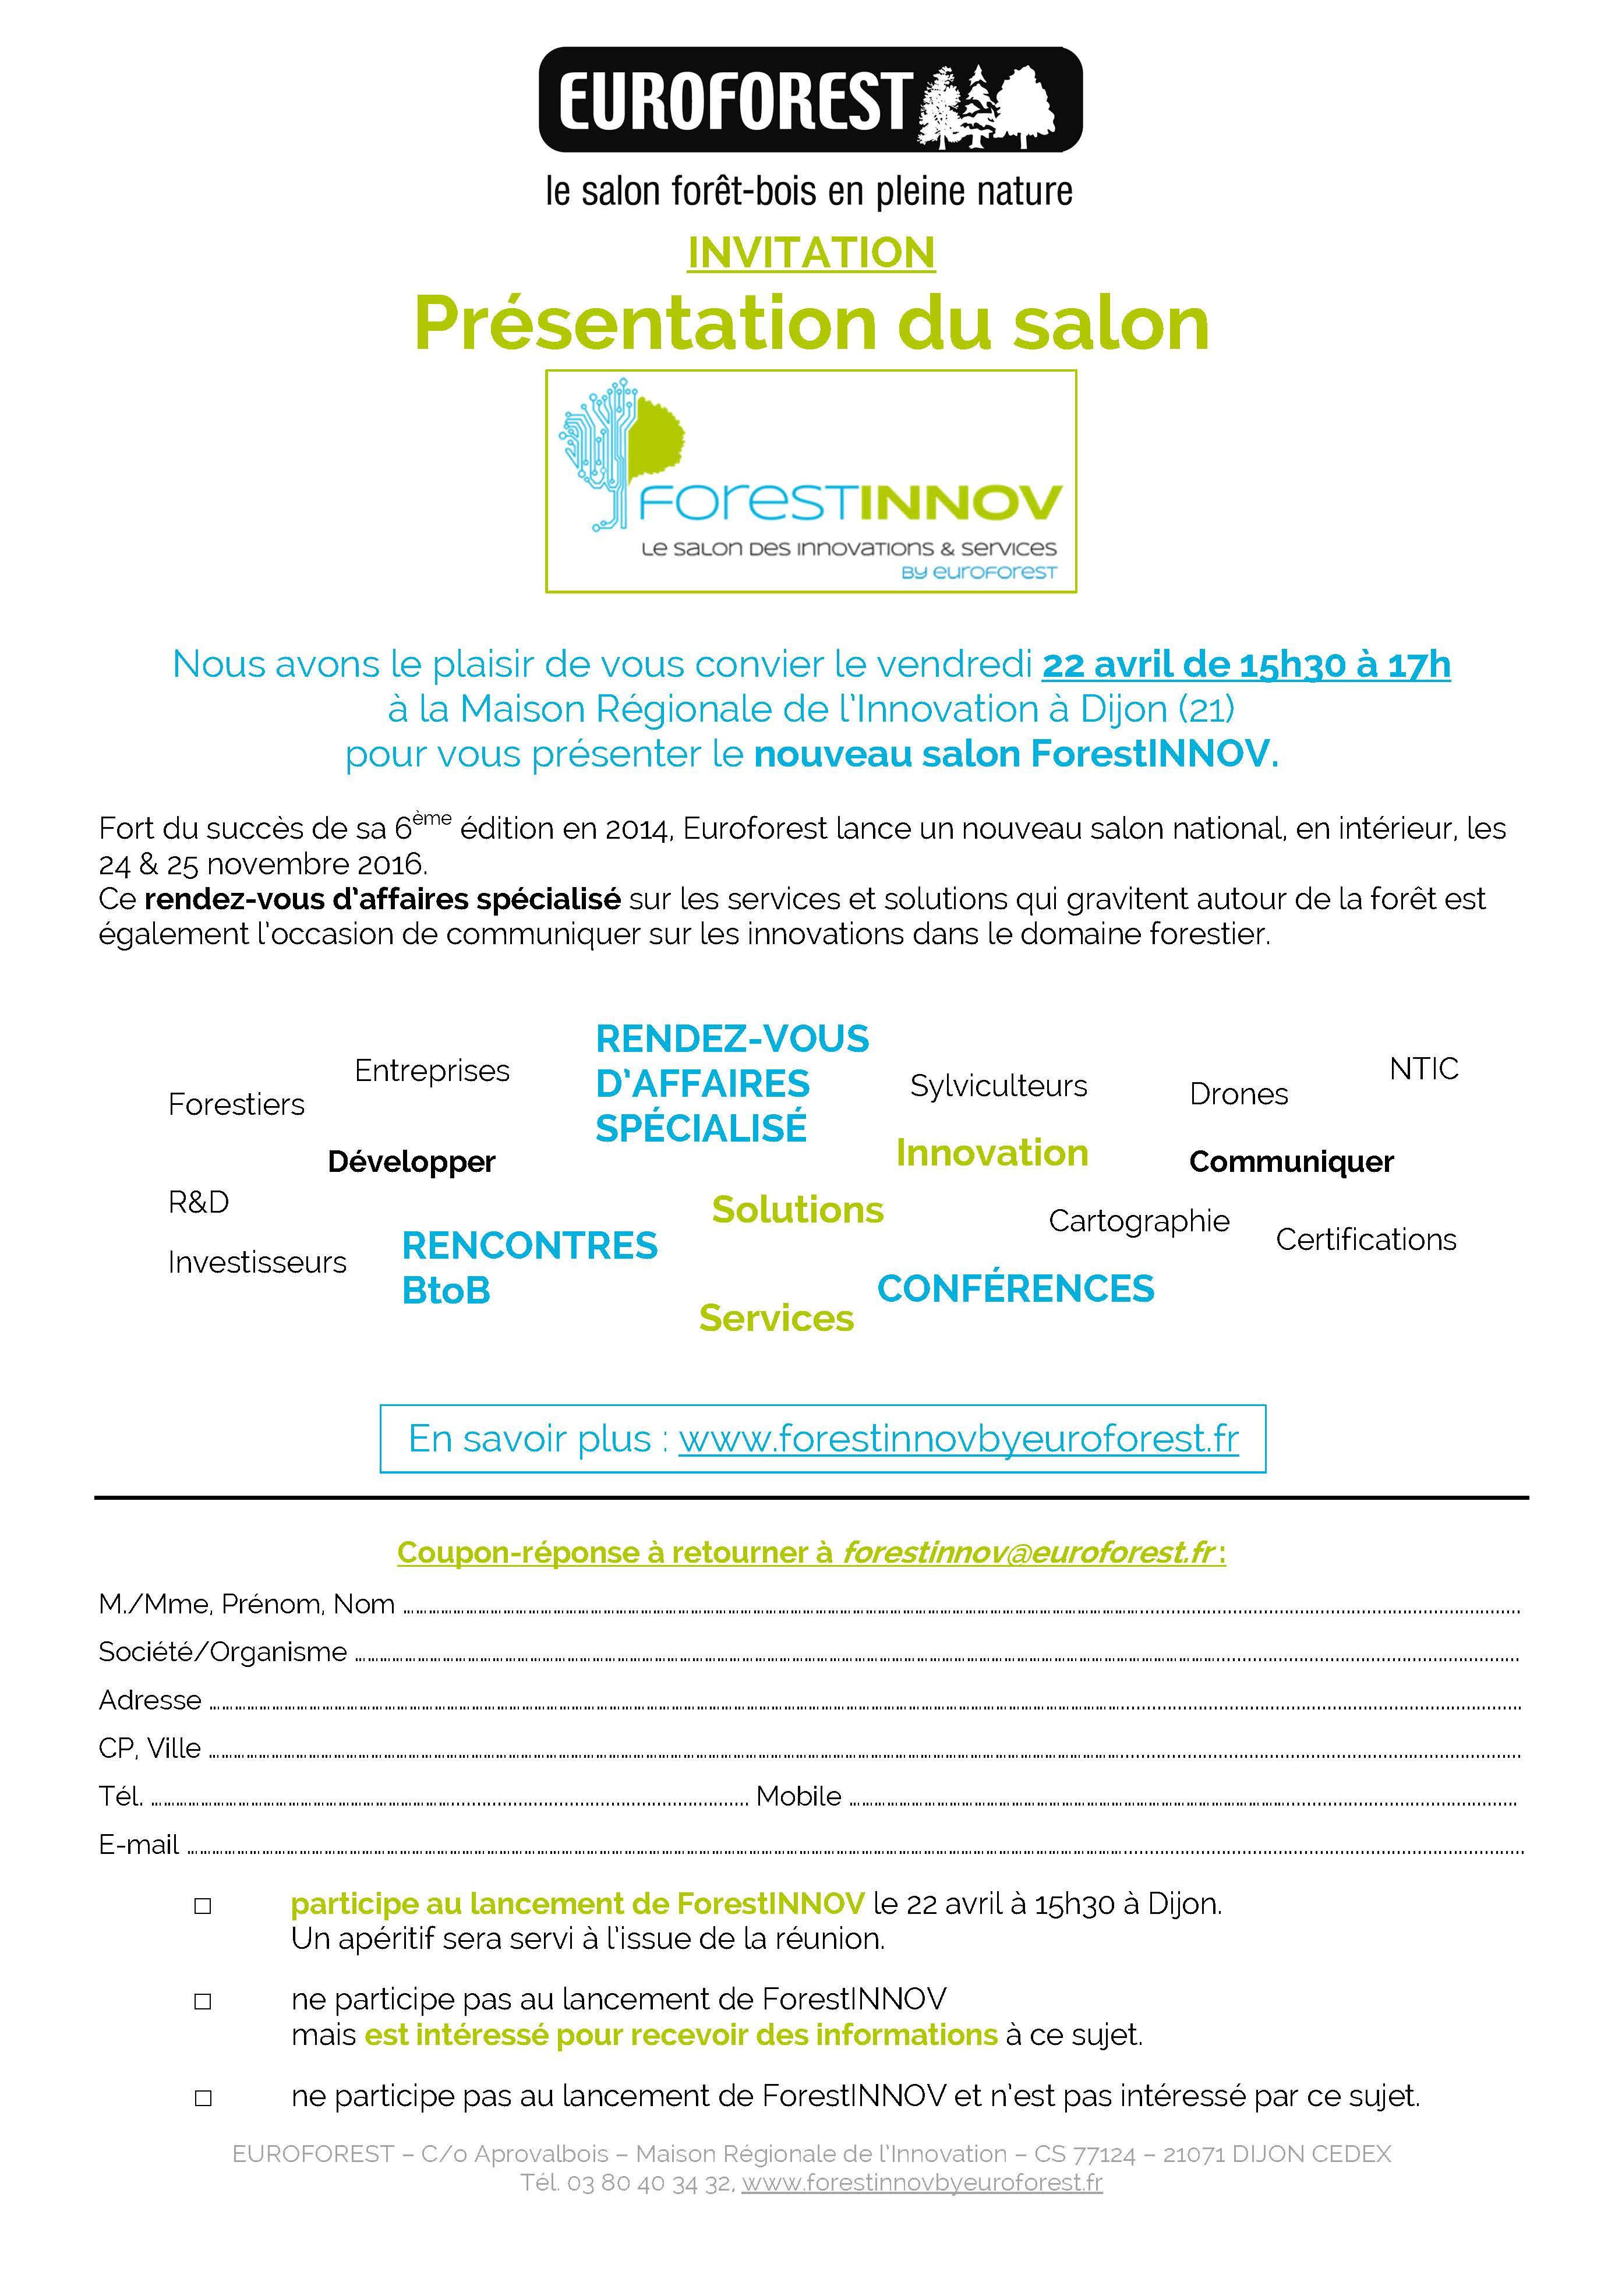 Invitation lancement ForestINNOV